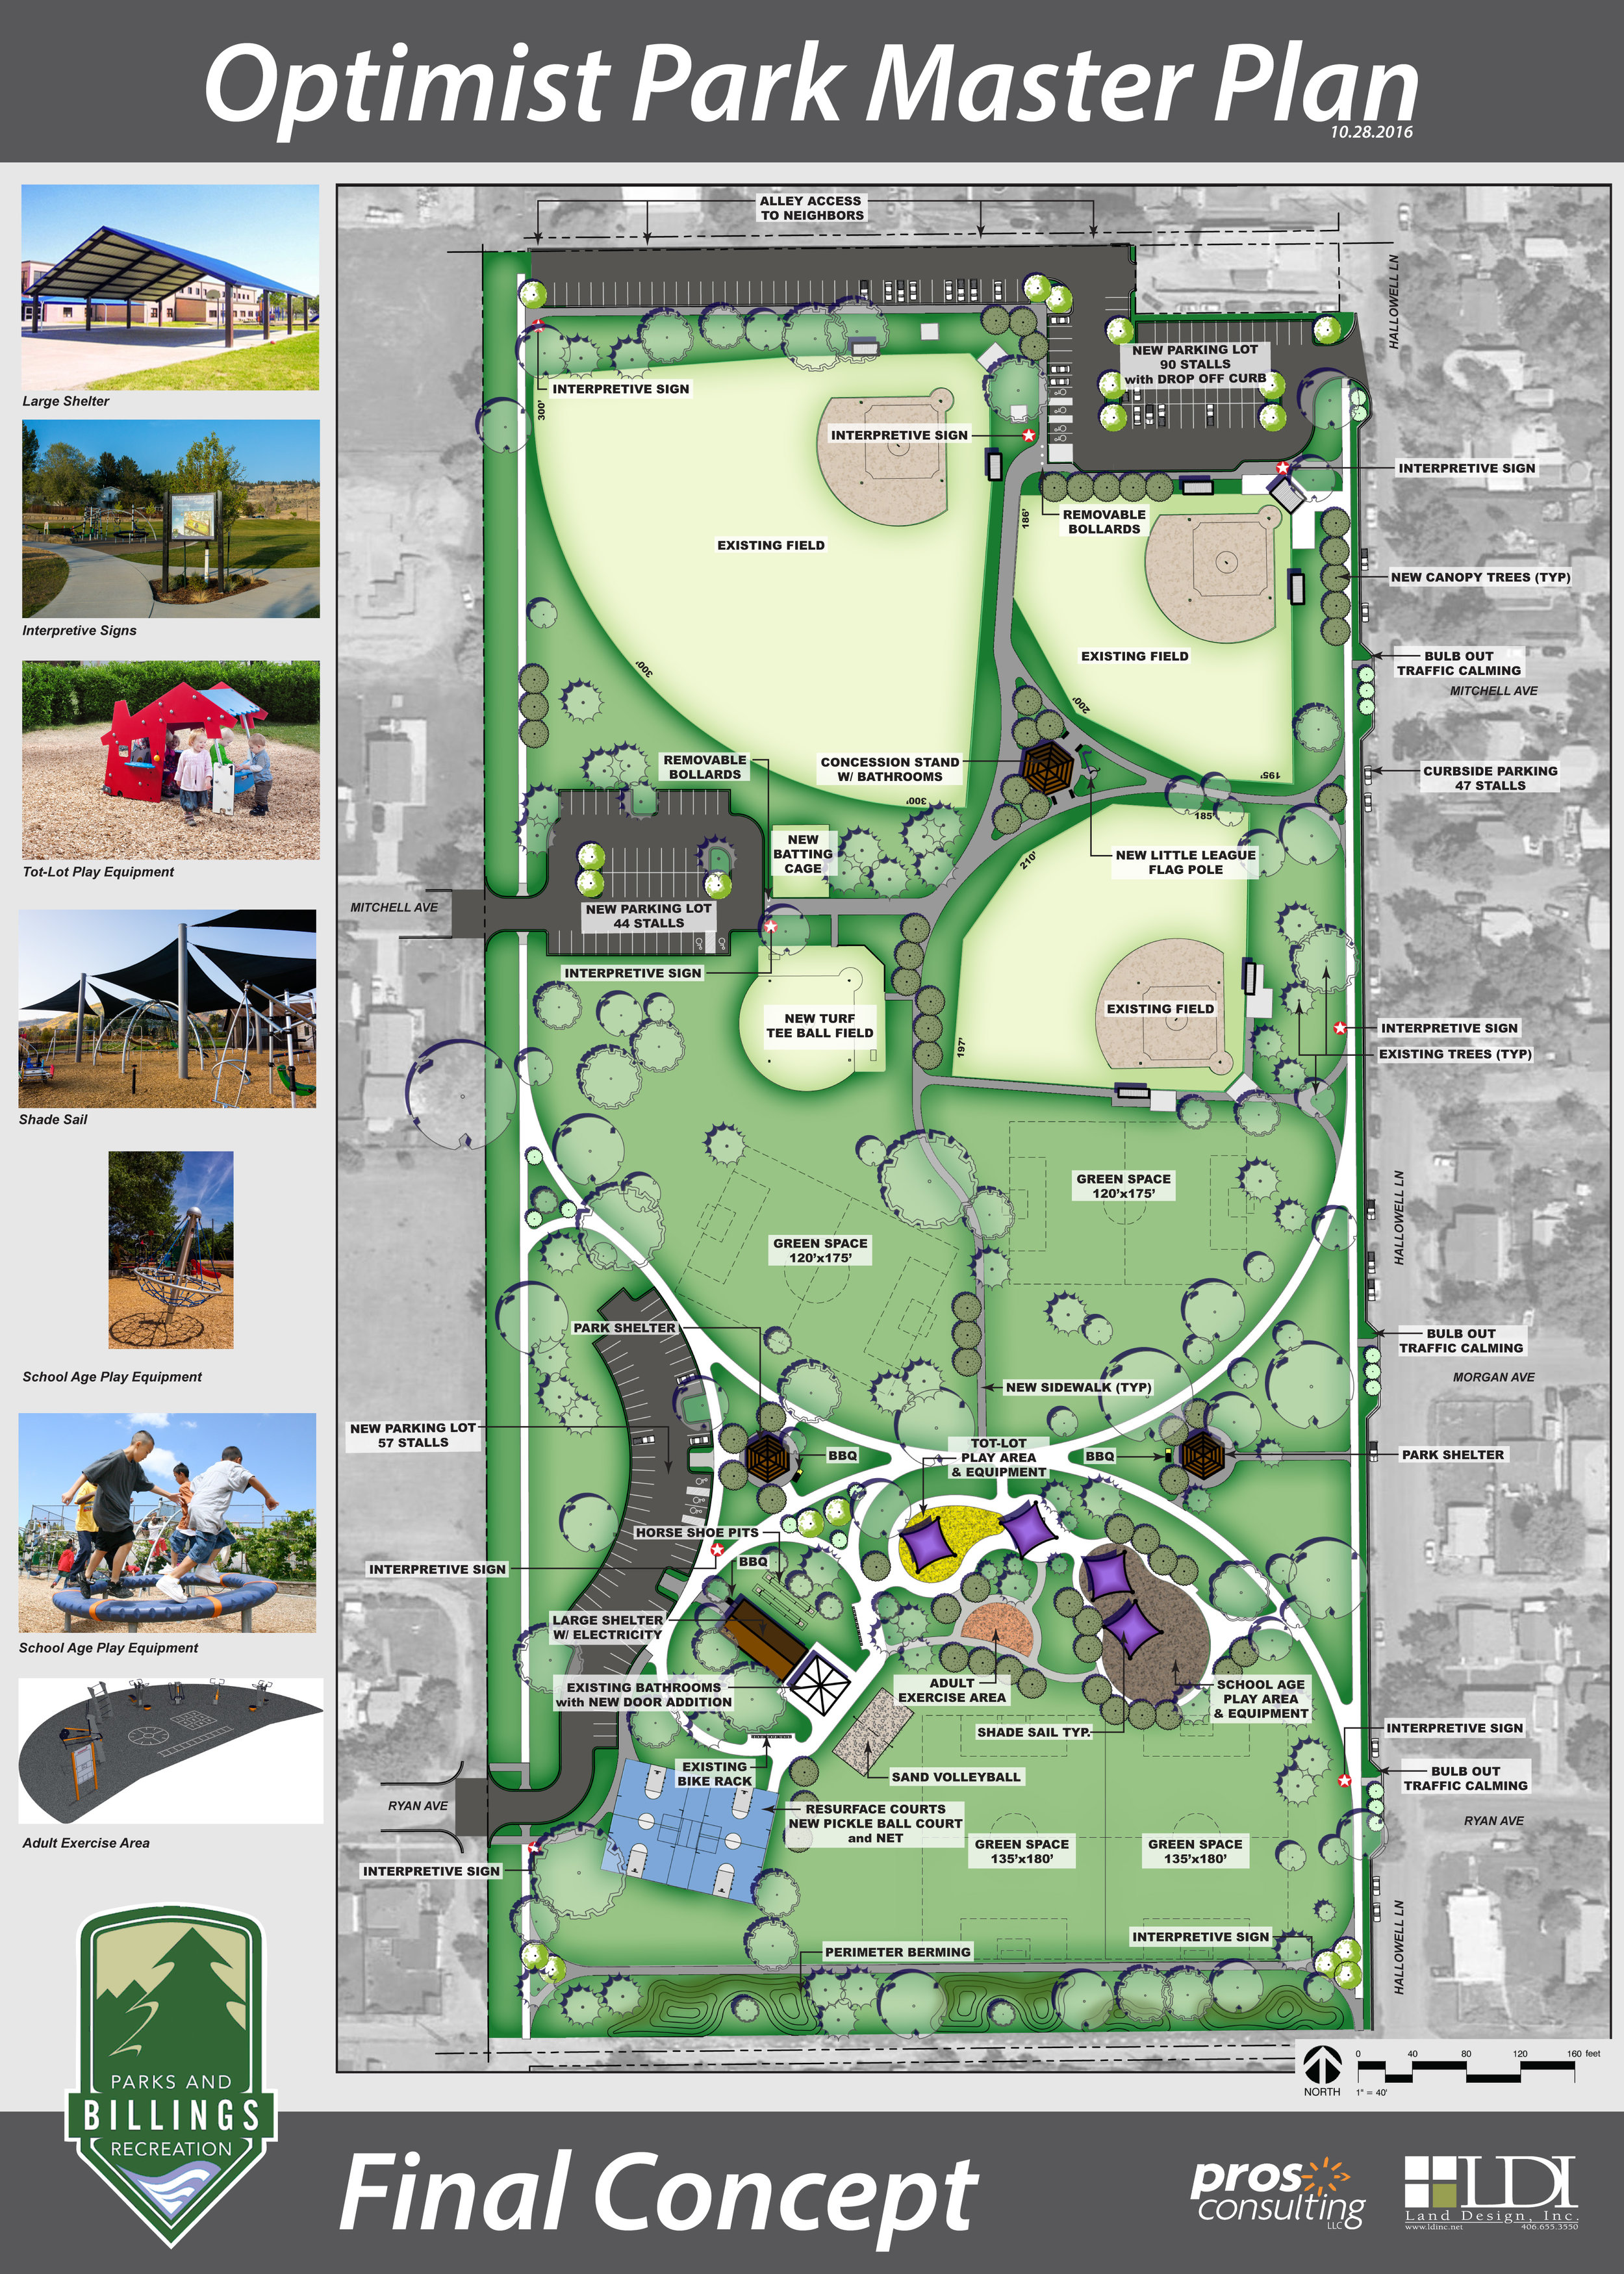 Optimist Park Master Plan